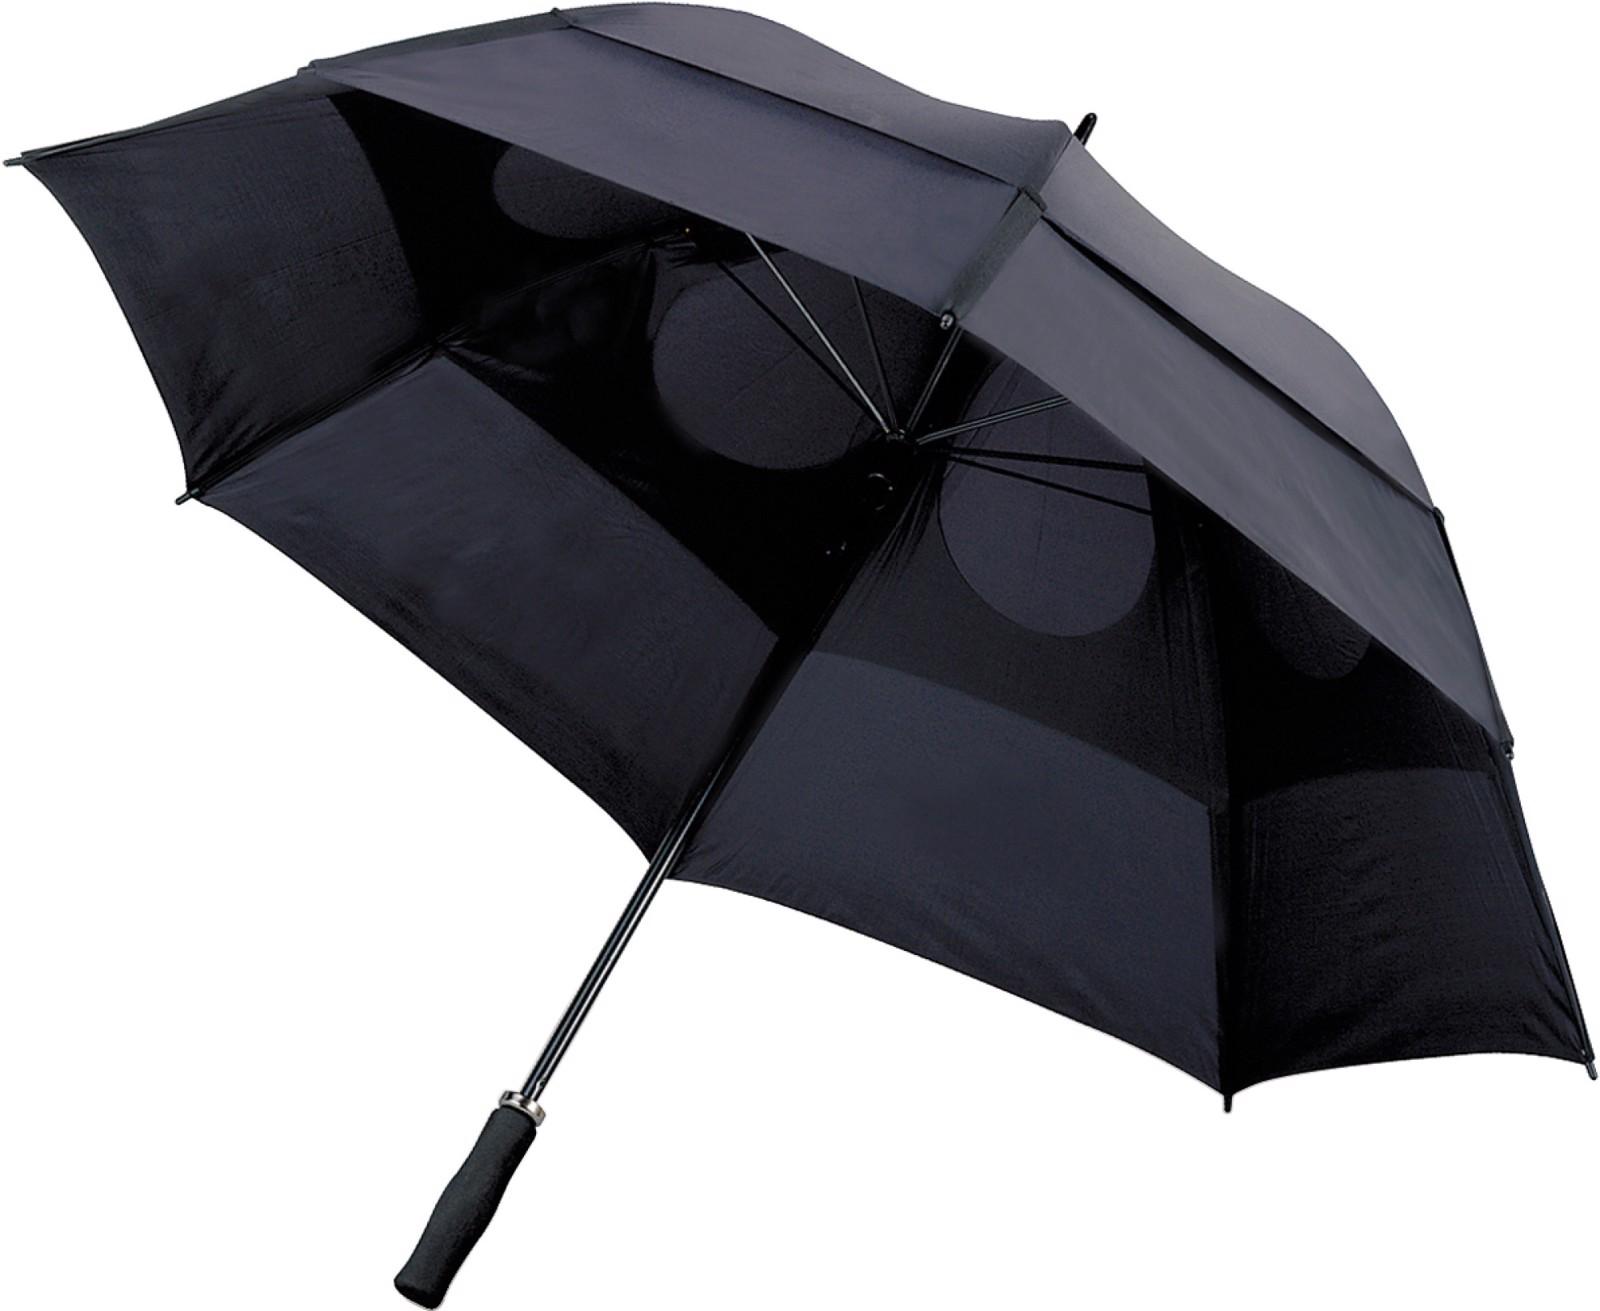 Polyester (210T) storm umbrella - Black